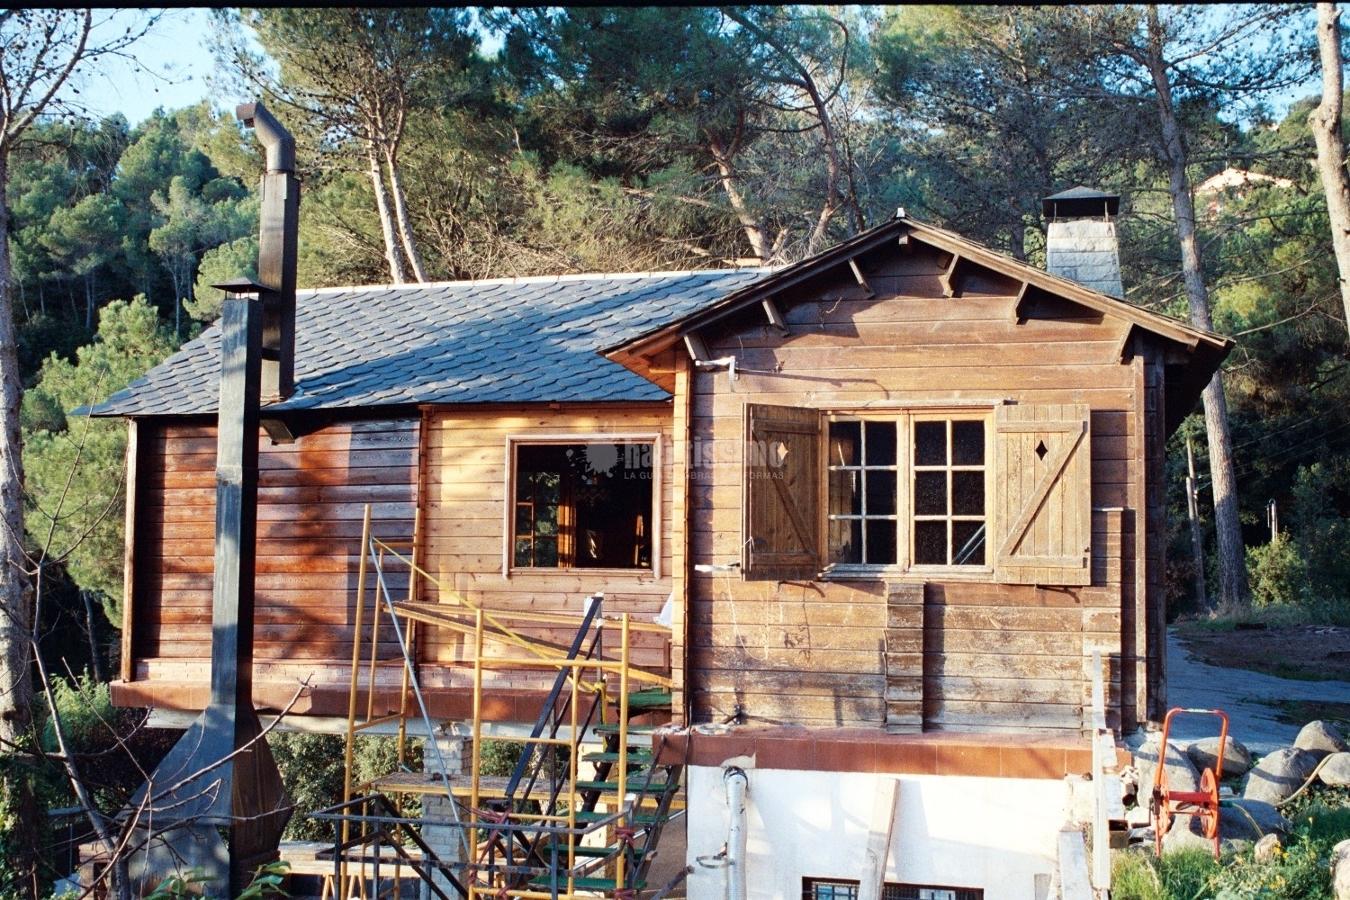 Rehabilitación y restauración de casas de madera